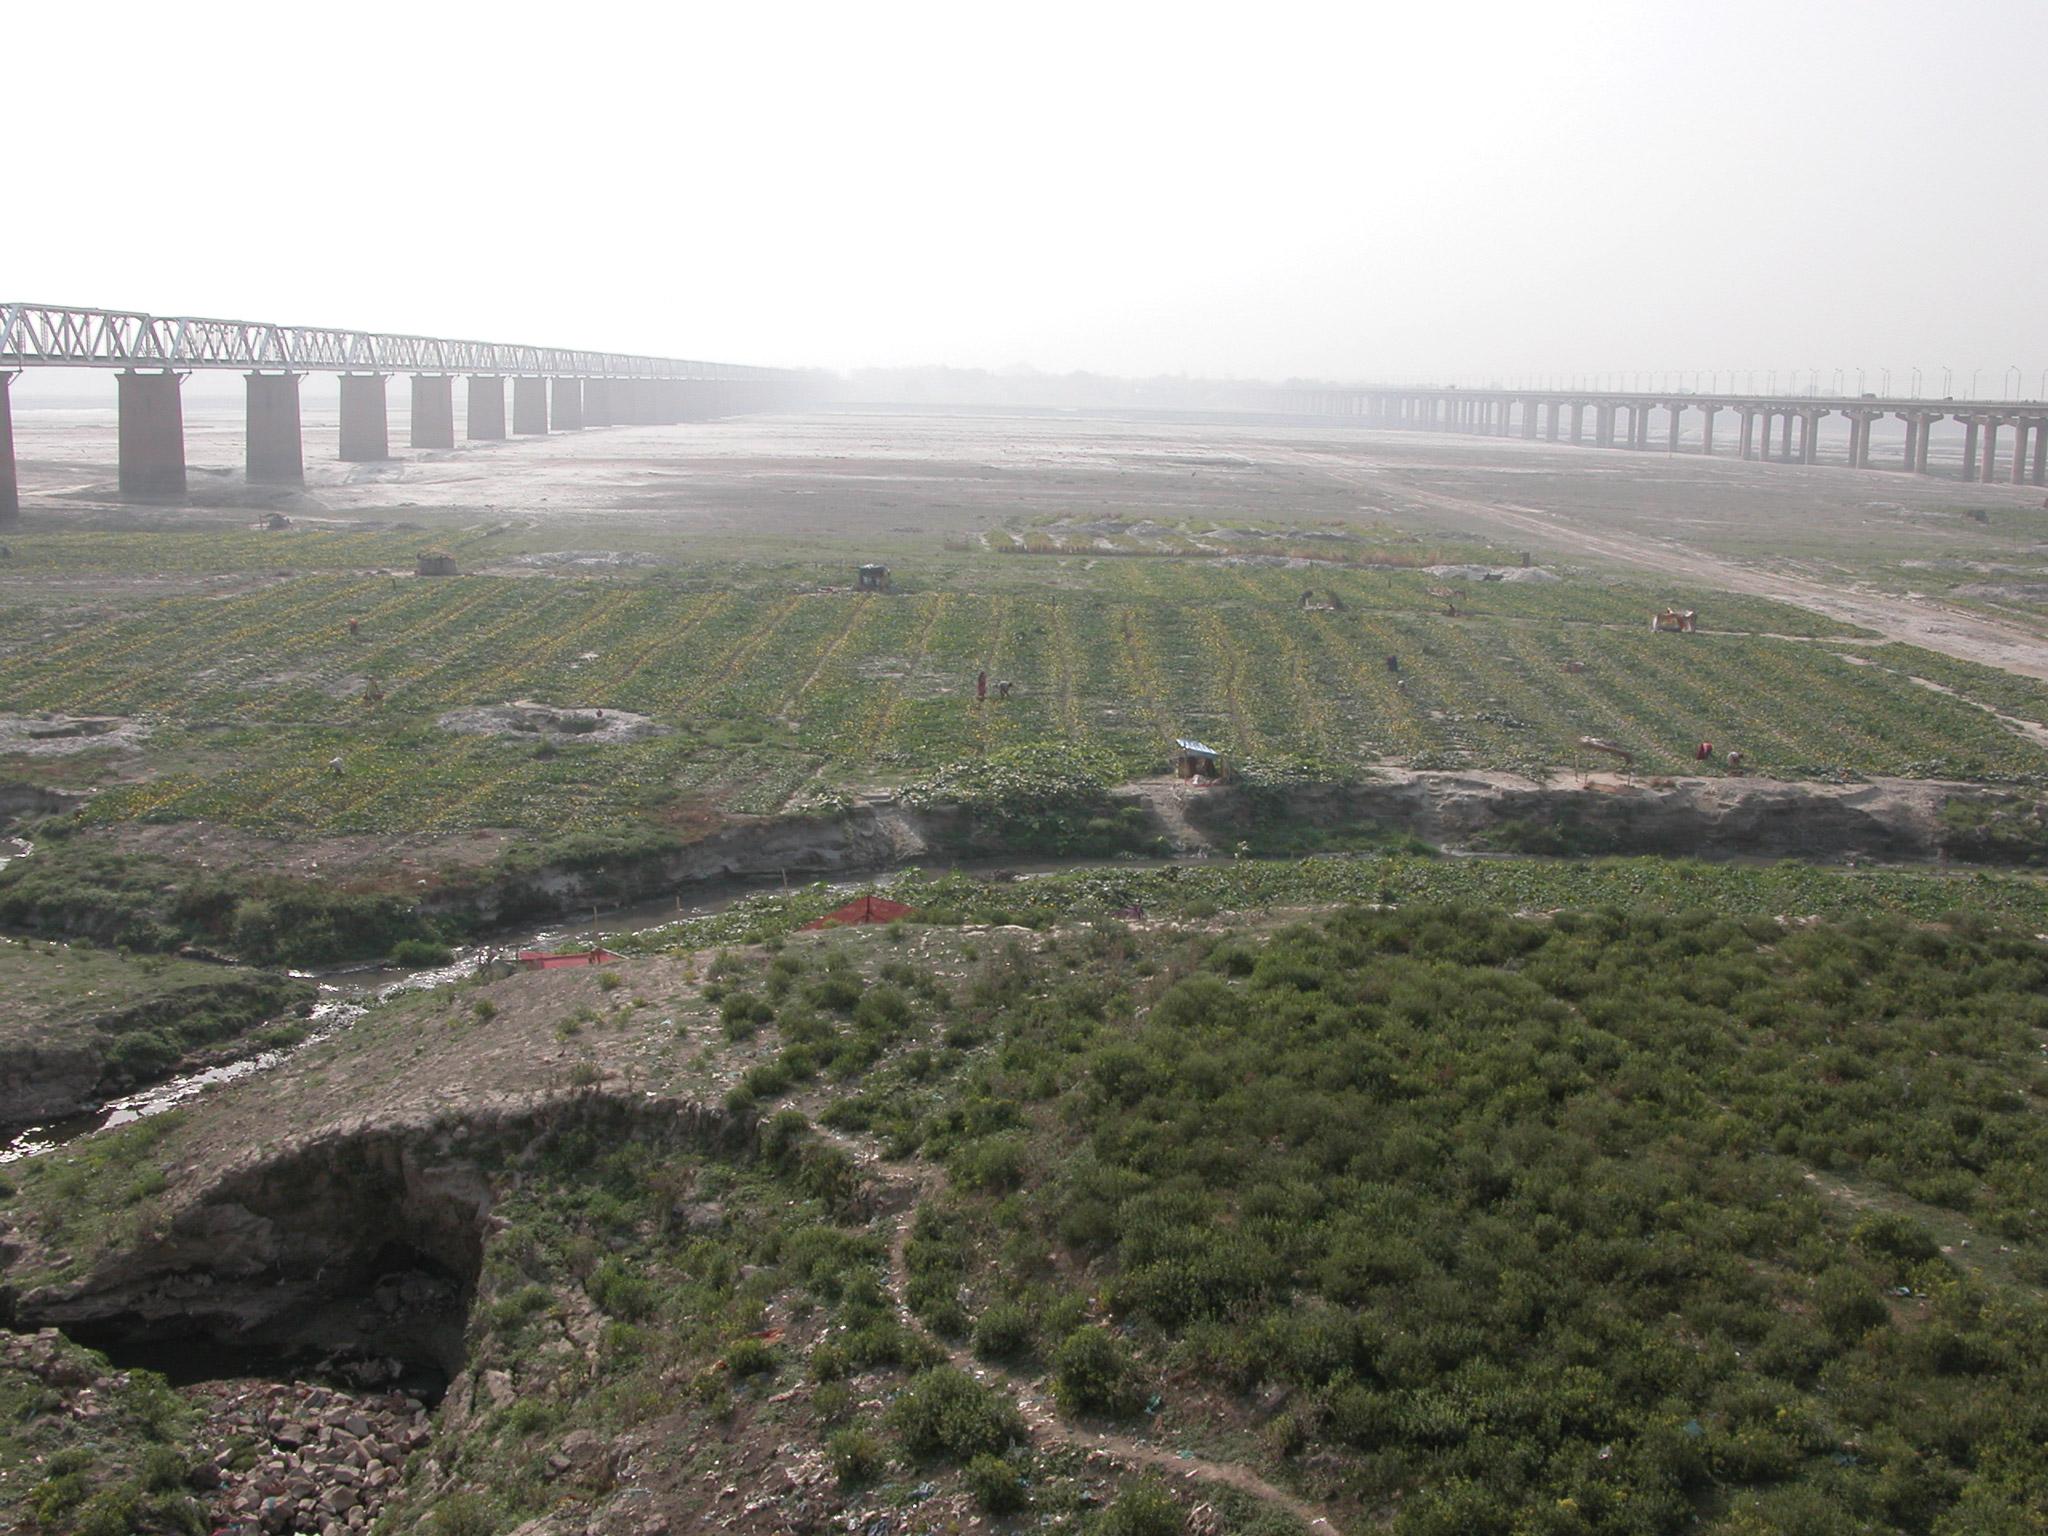 North of the Triveni Sangam at Allahabad, Uttar Pradesh, 2006. Photo: Anthony Acciavatti.